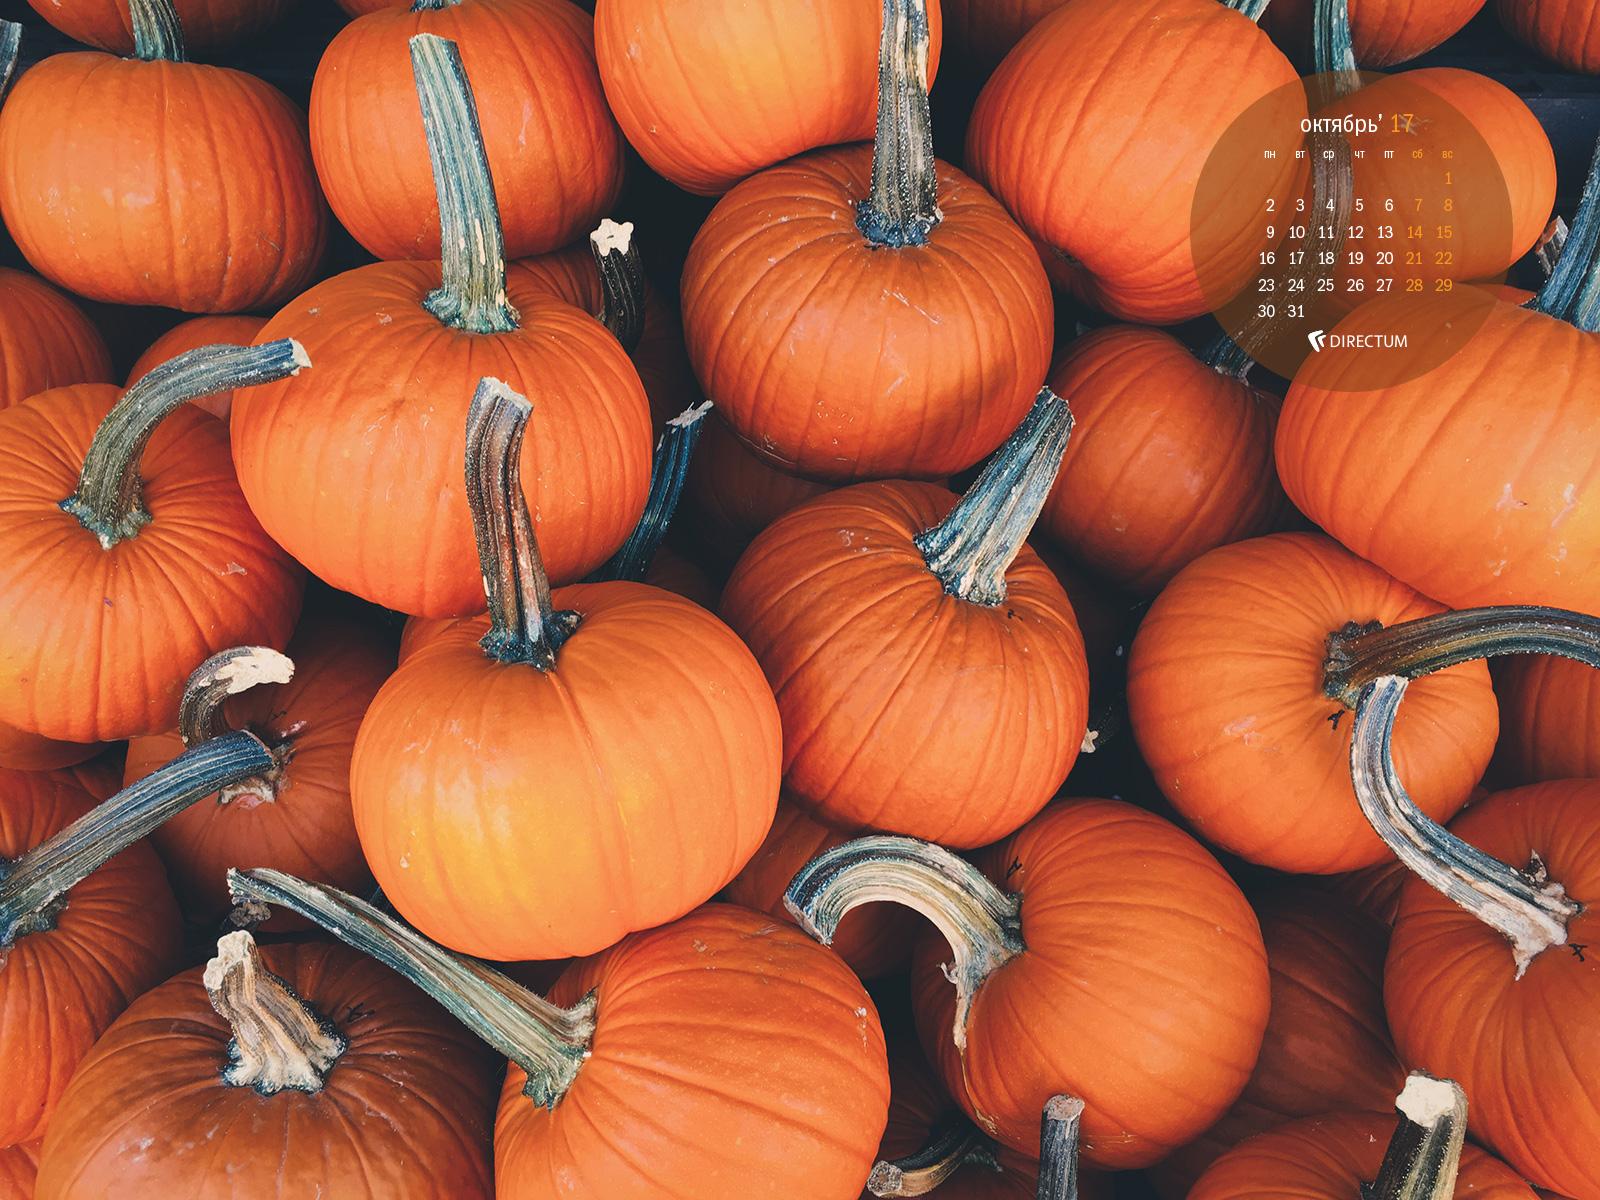 Октябрь с календарем DIRECTUM